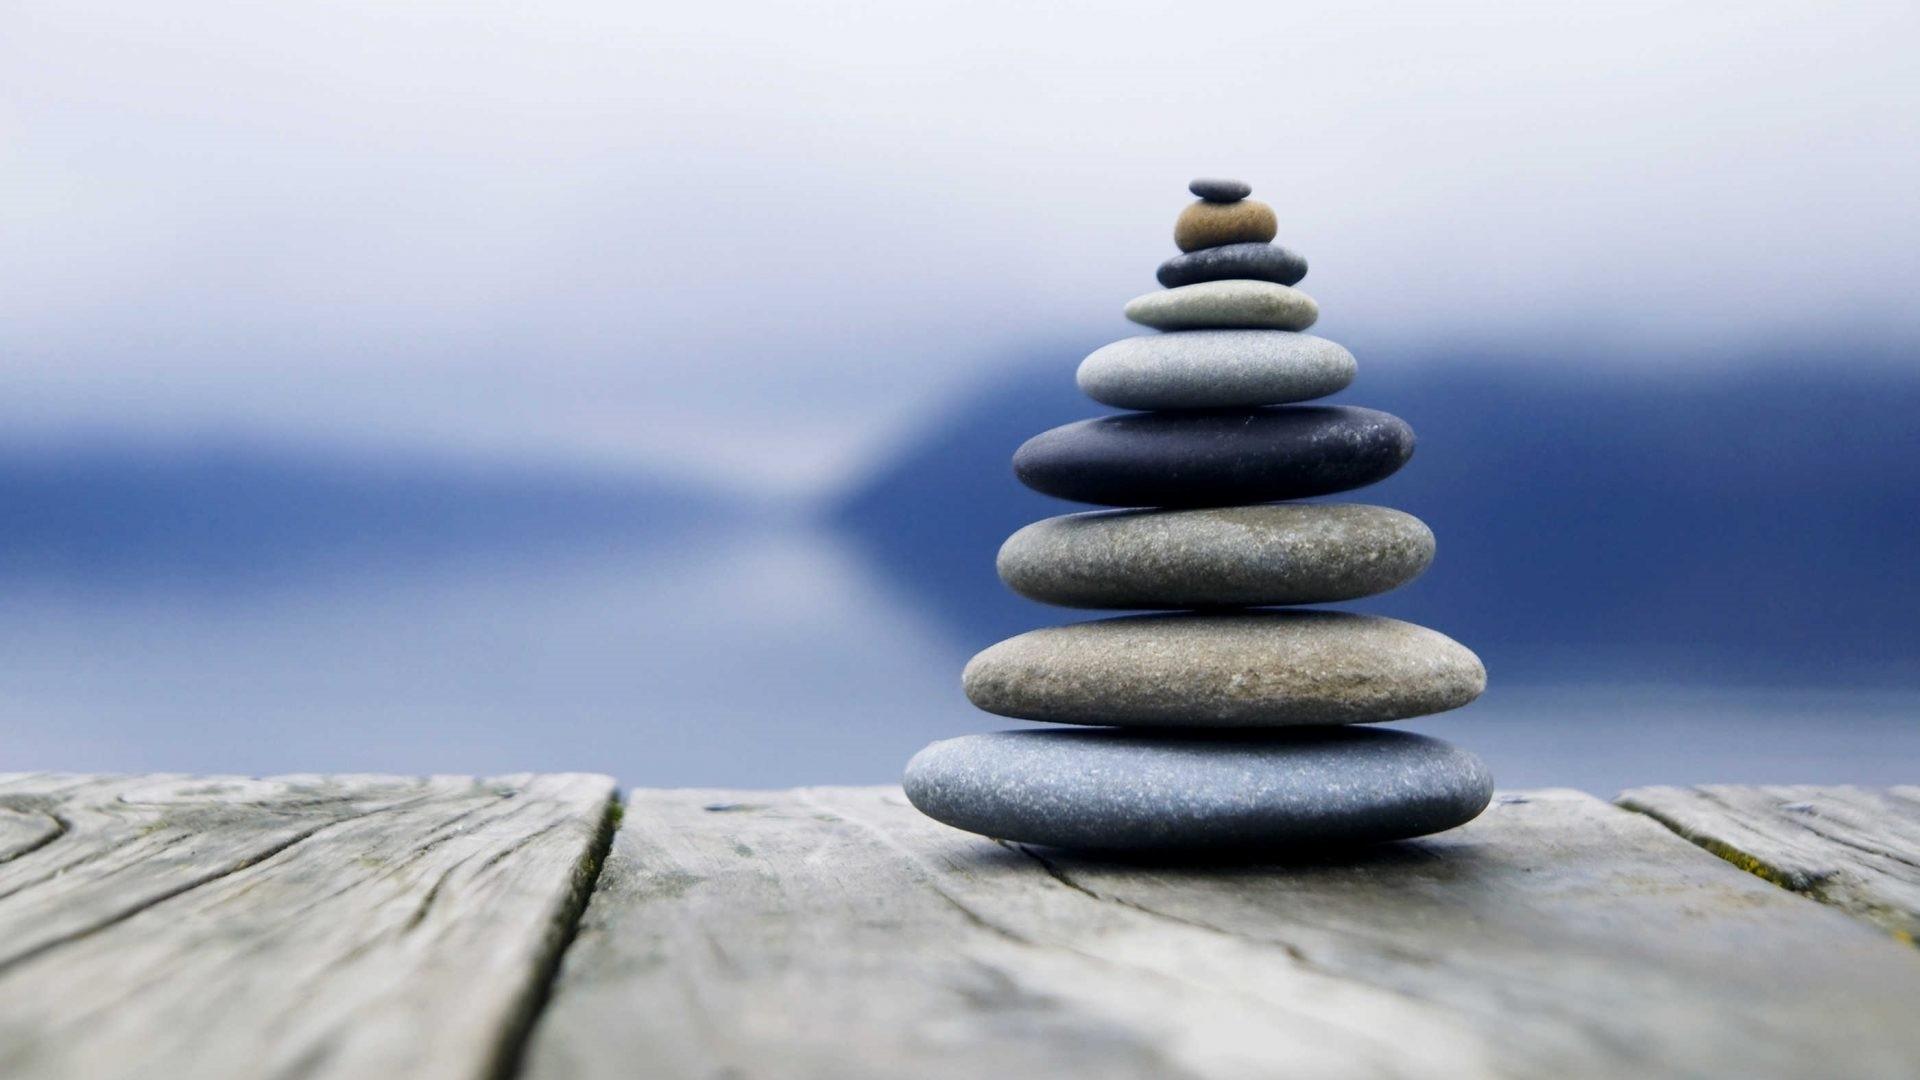 Zen Stone Pyramid wallpaper for pc